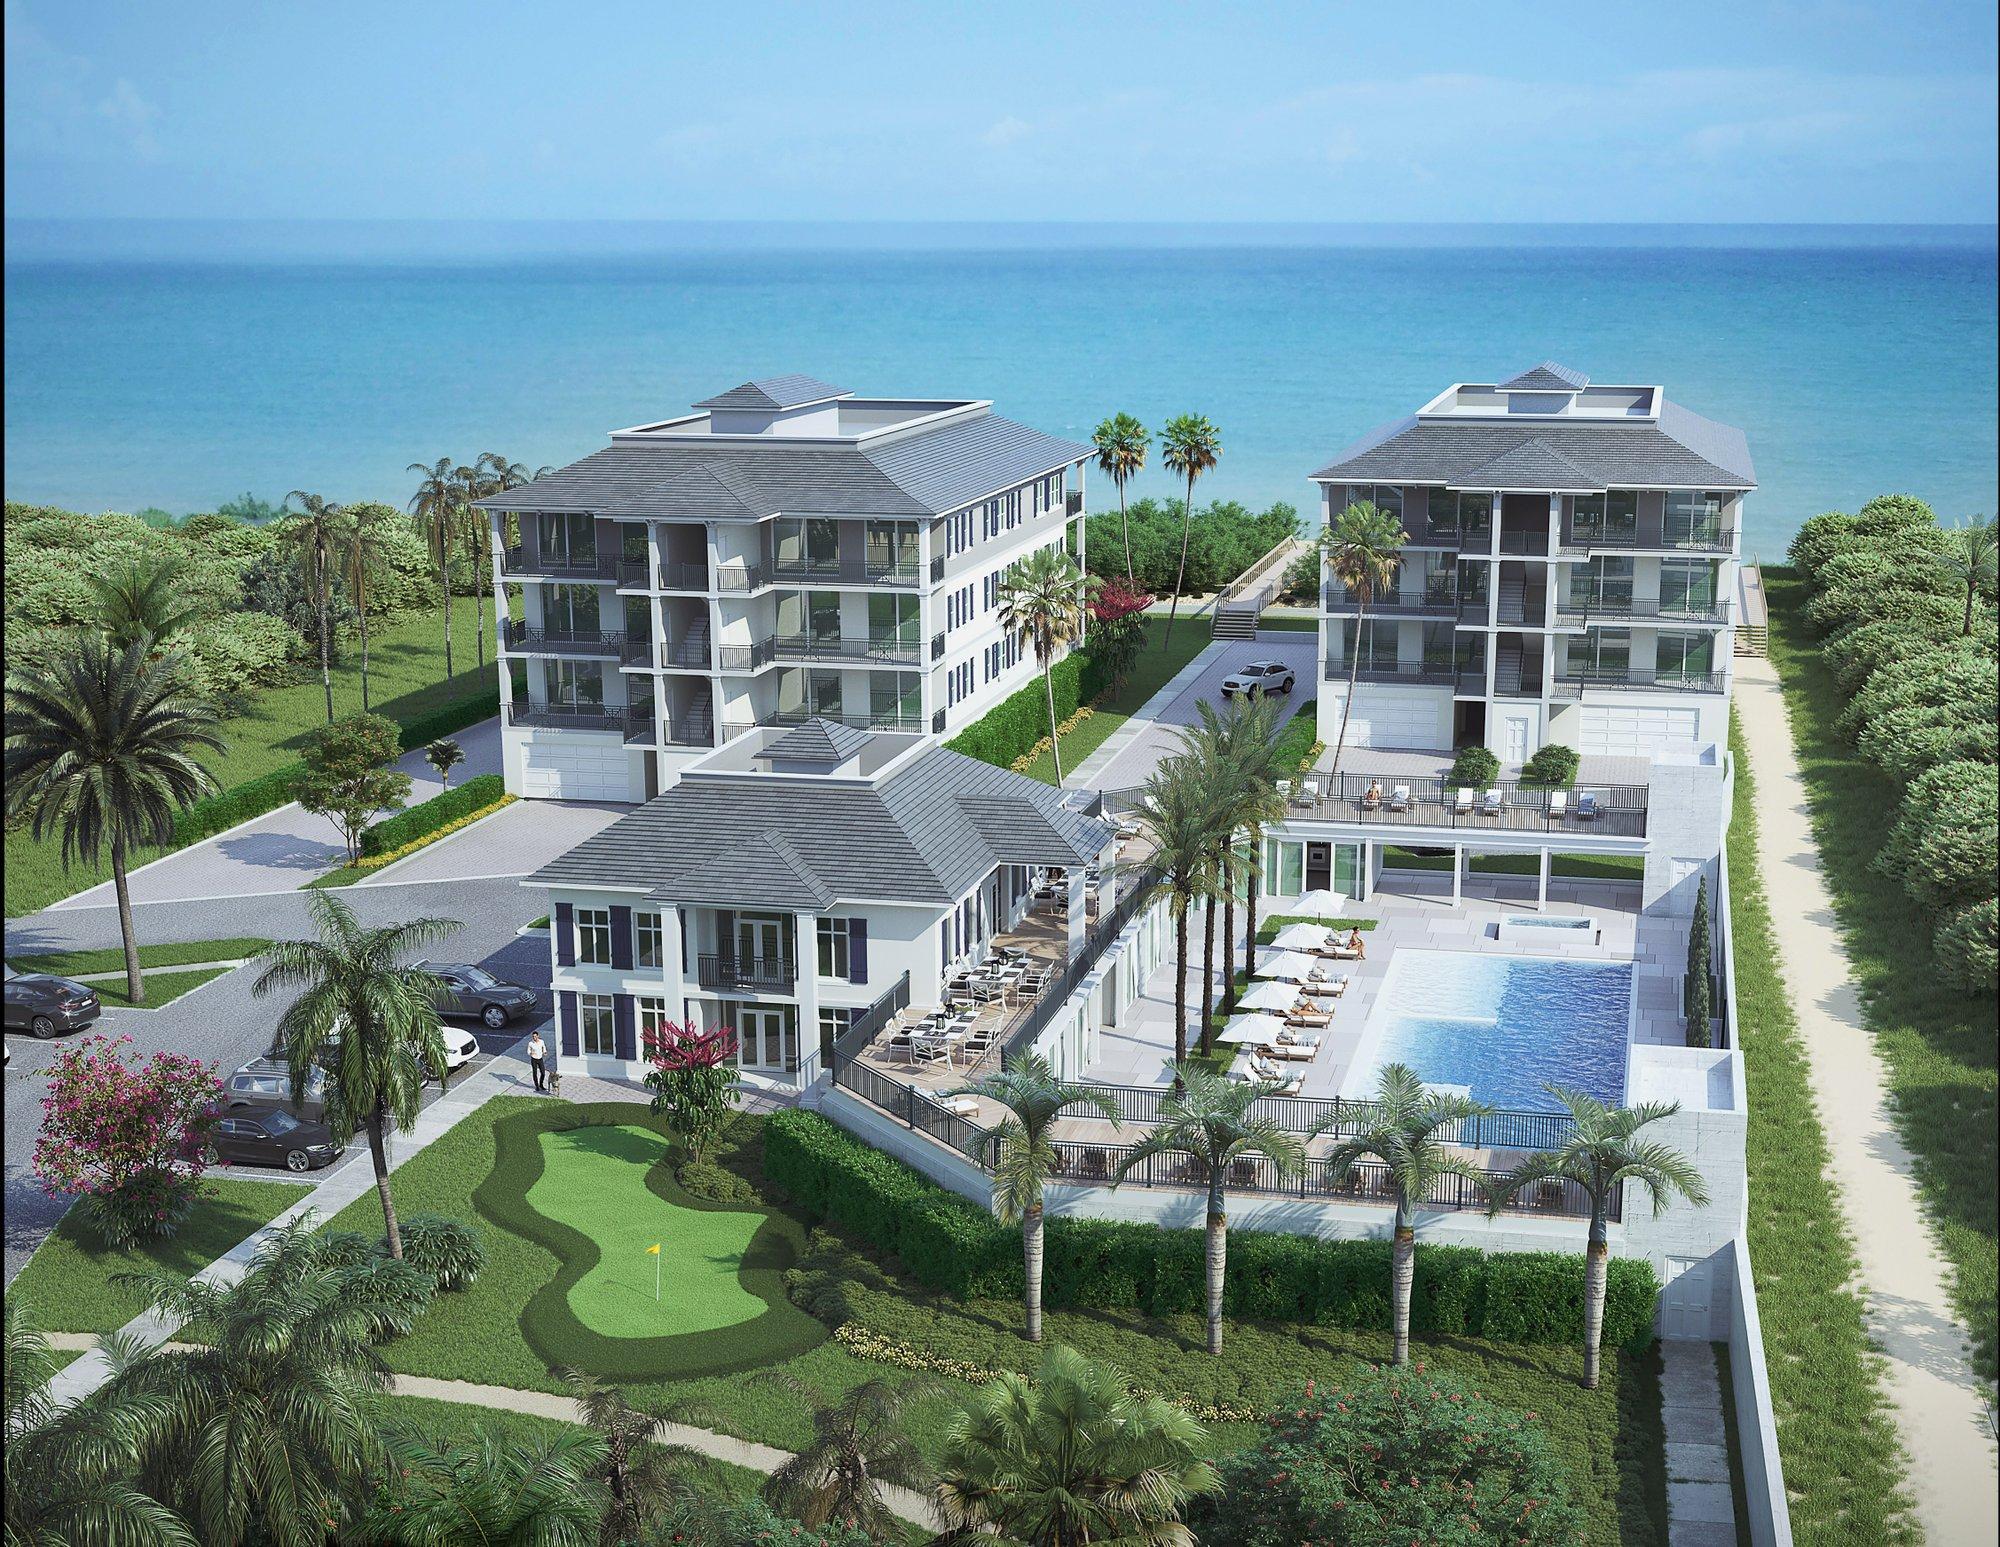 Vero Beach, Florida, United States 1